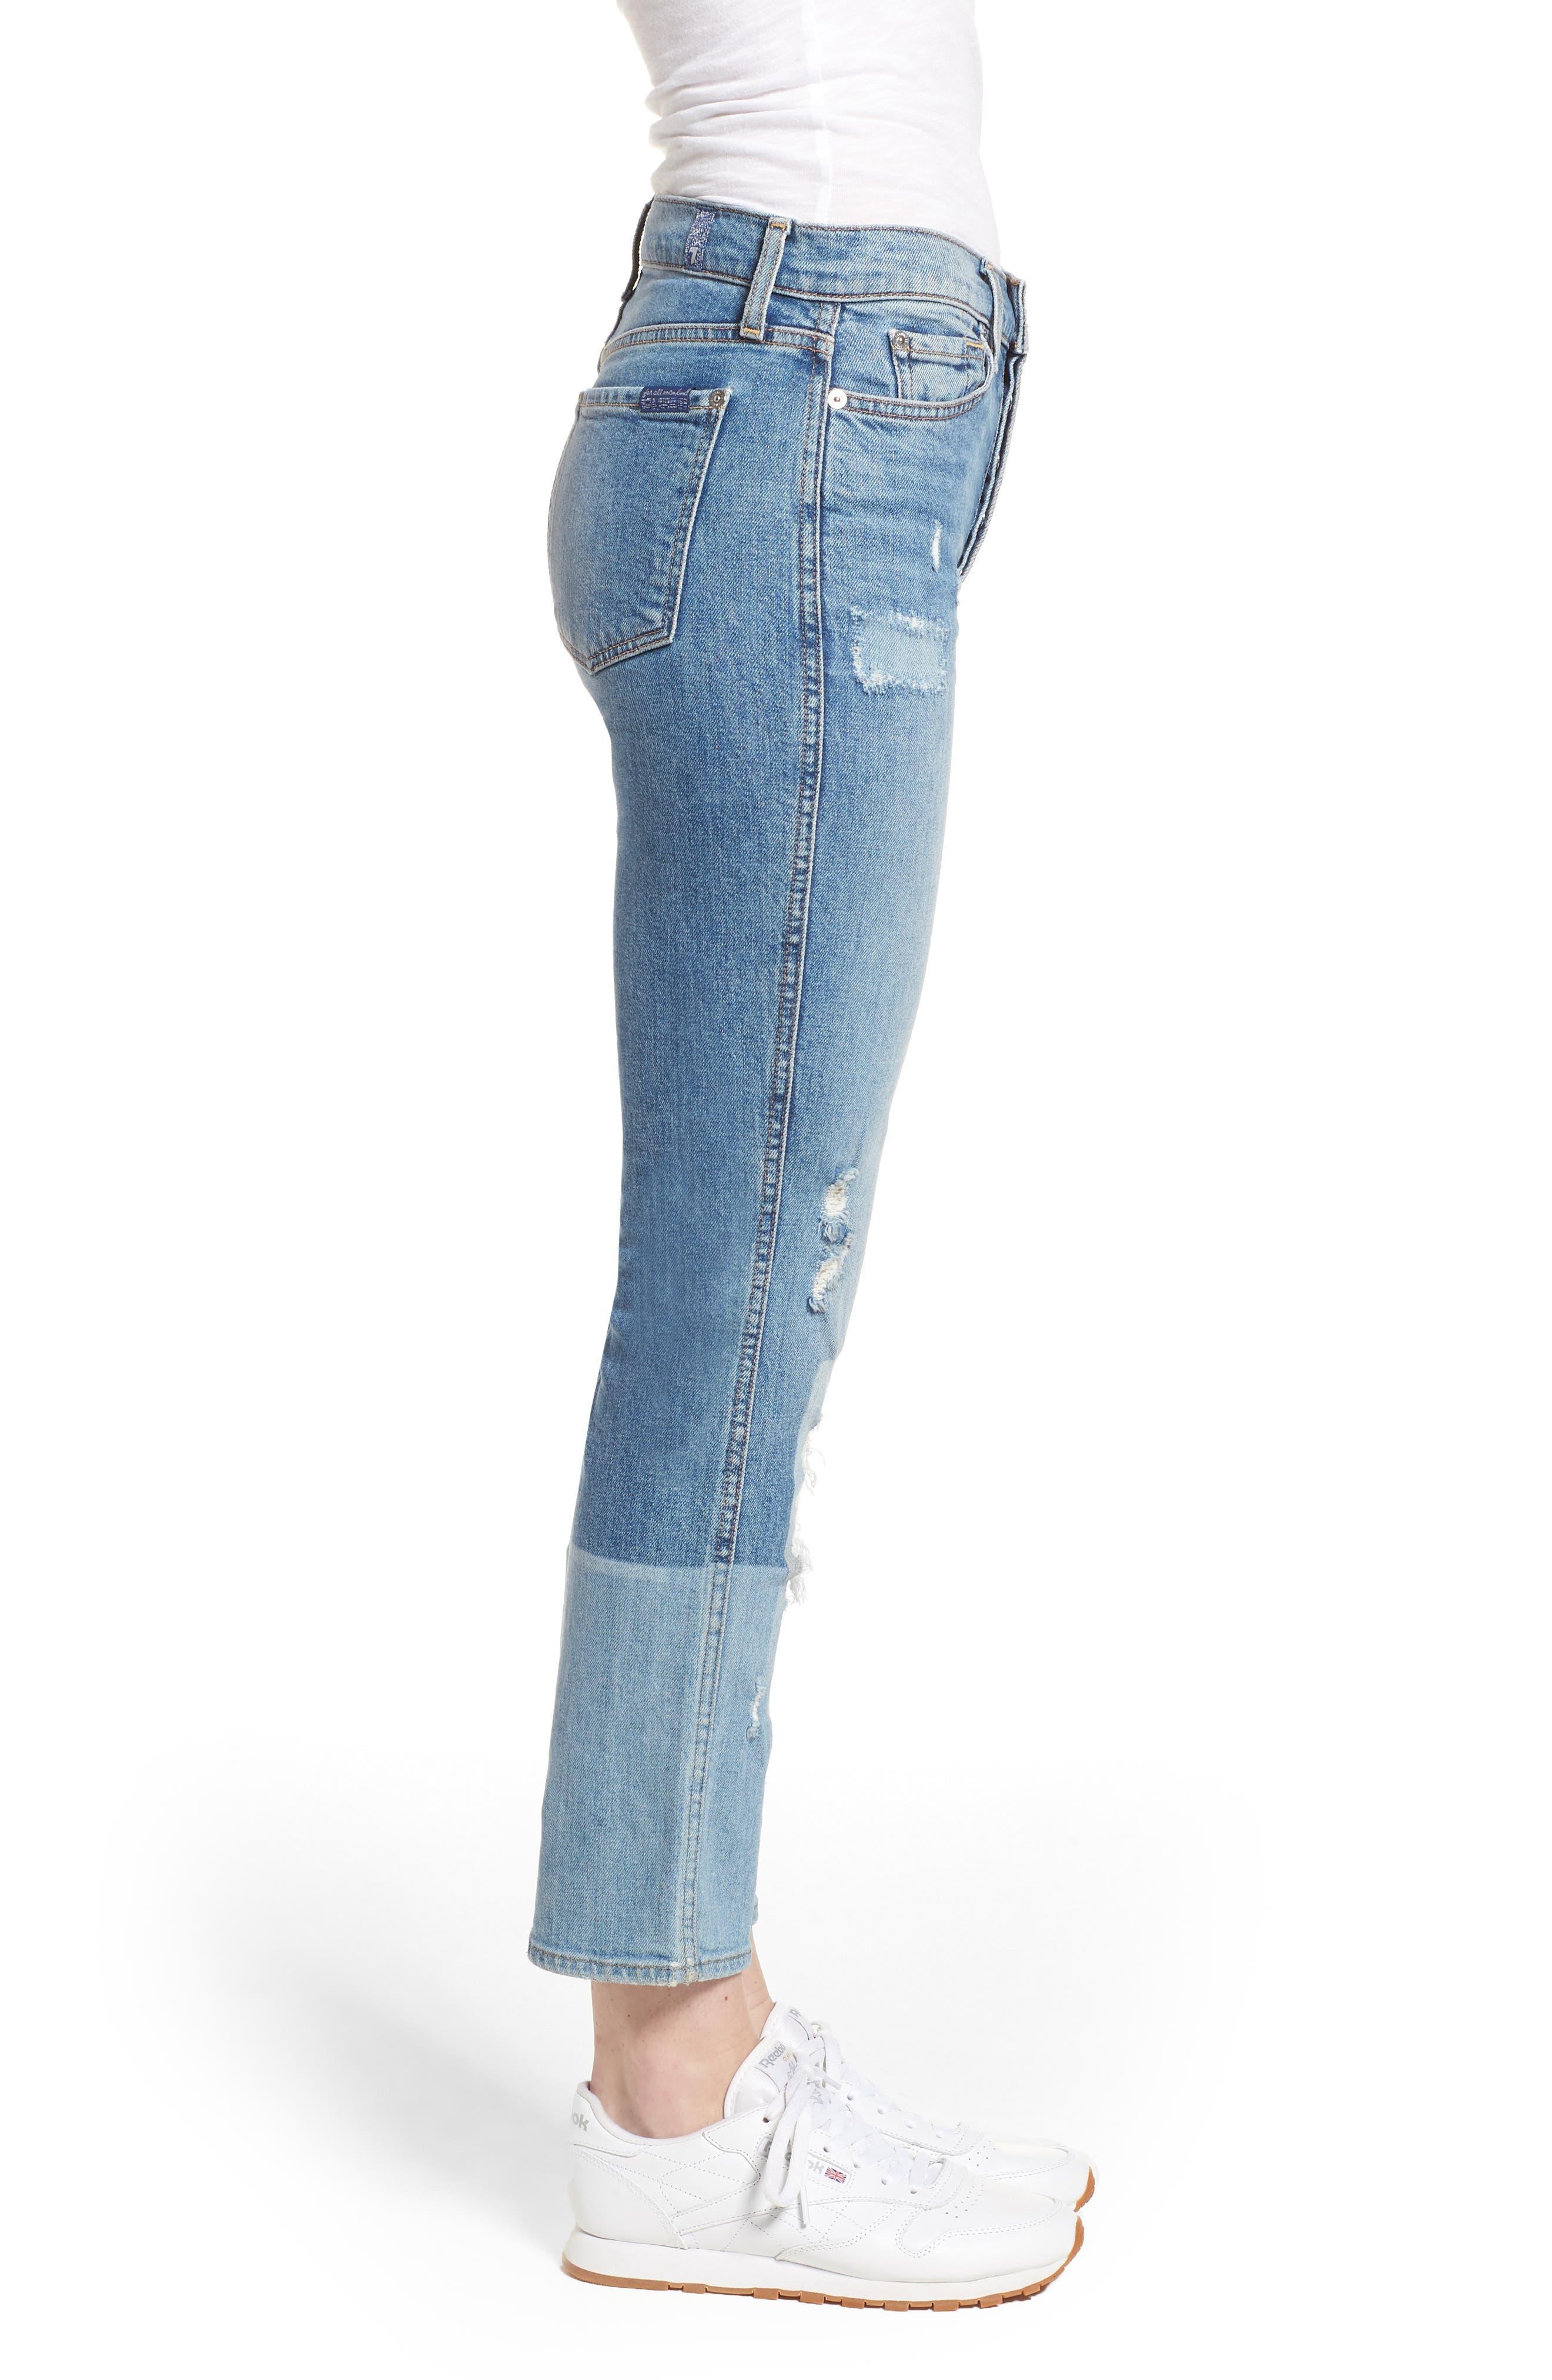 Edie High Waist Crop Straight Leg Jeans,                             Alternate thumbnail 3, color,                             Laser Denim W/ Patches